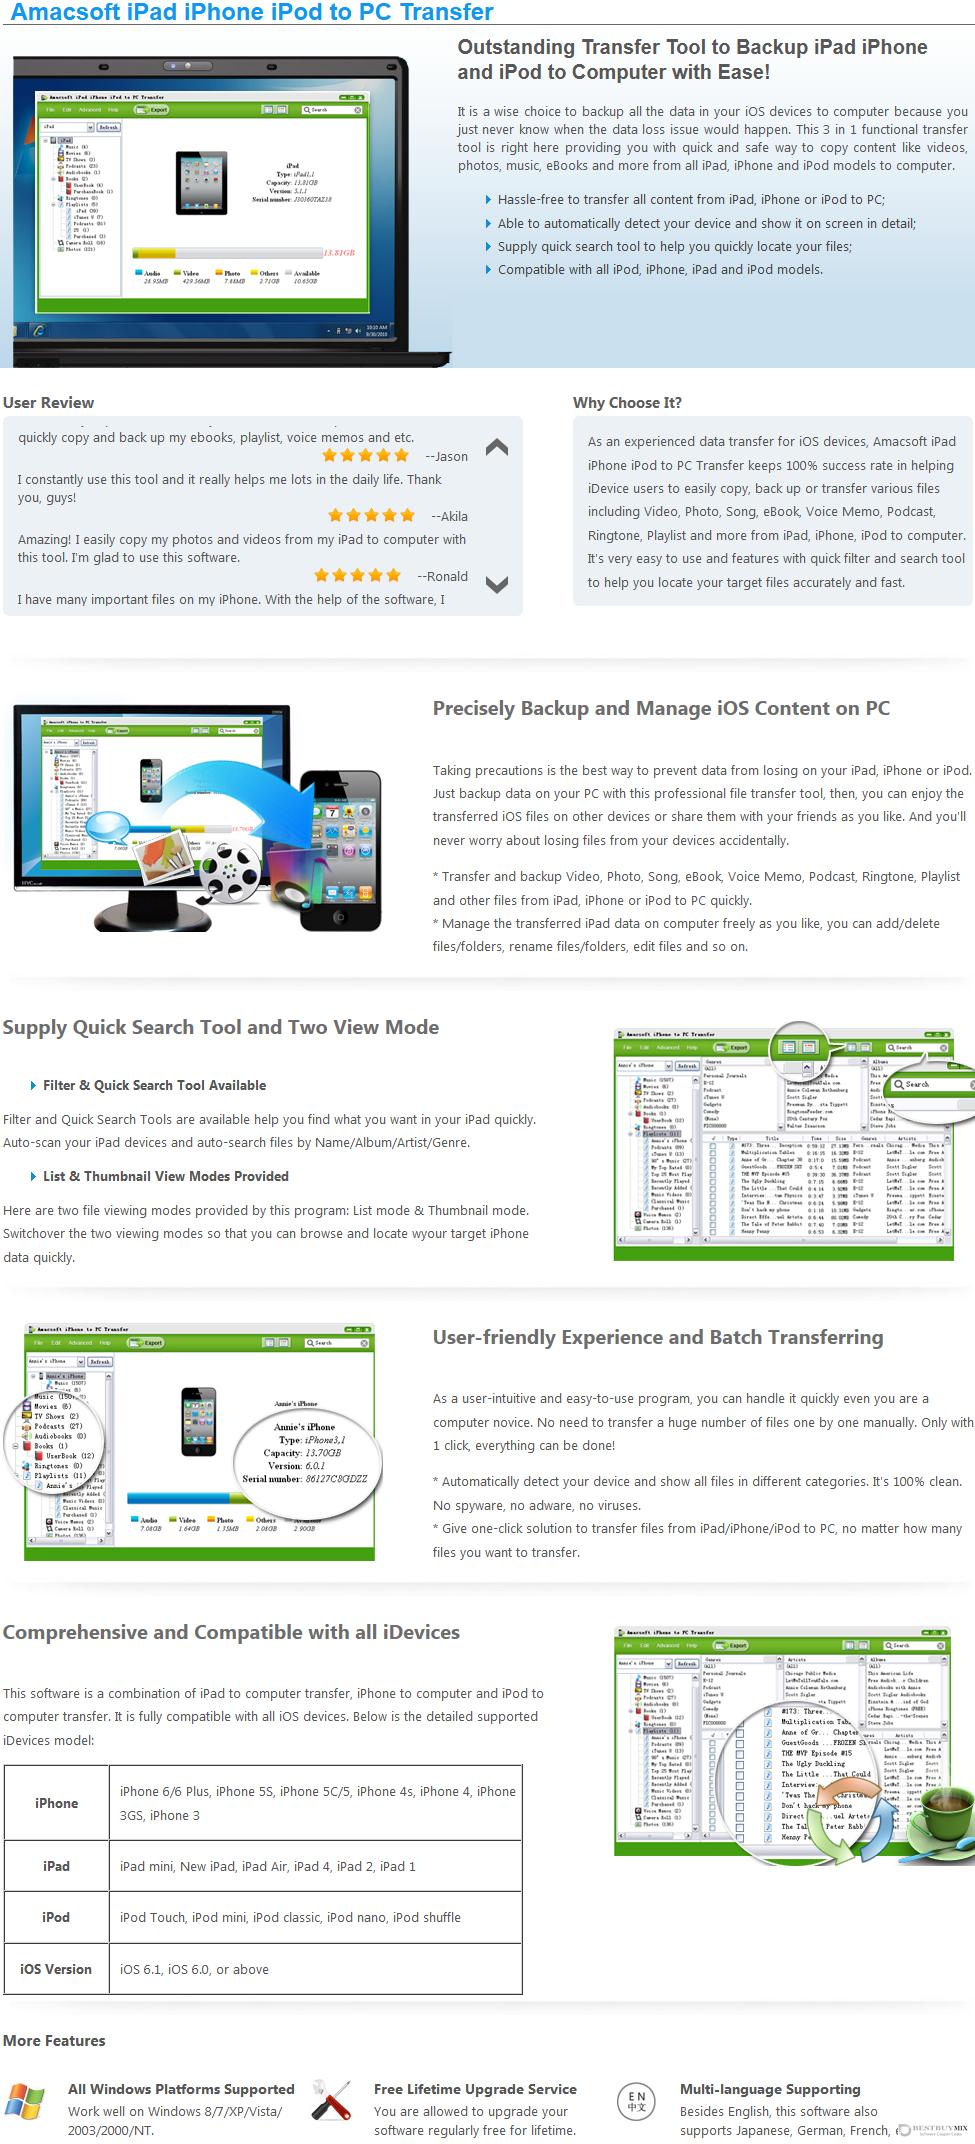 Amacsoft iPad/iPhone/iPod to PC Transfer Discount Coupon Code